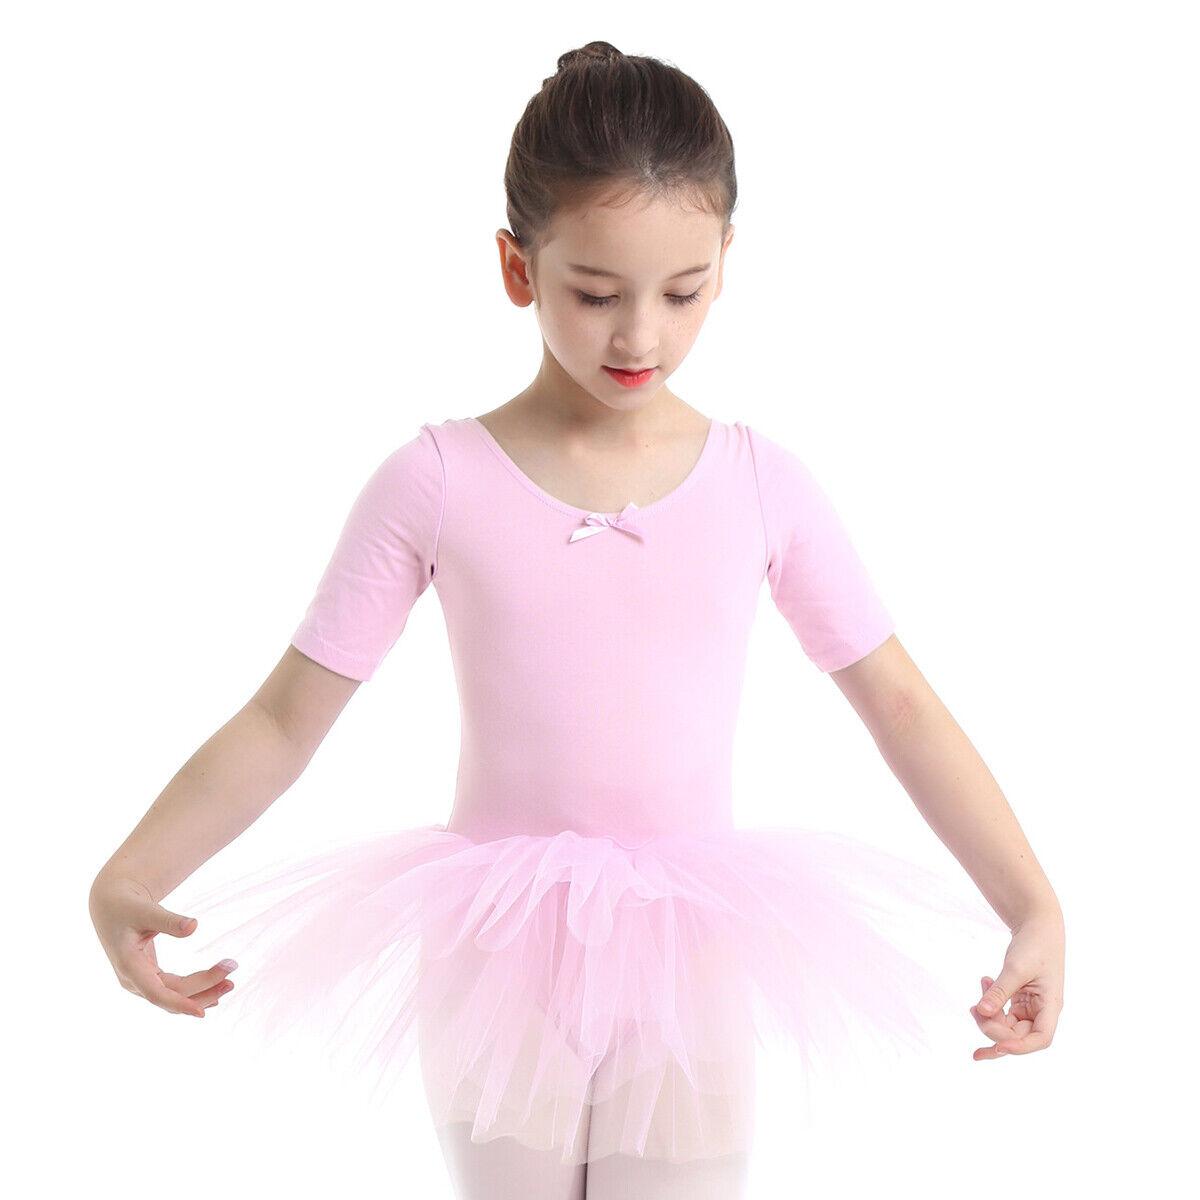 Girls Ballet Dance Dress Gymnastic Short Sleeve Leotard Tutu Skirts Dancewear UK